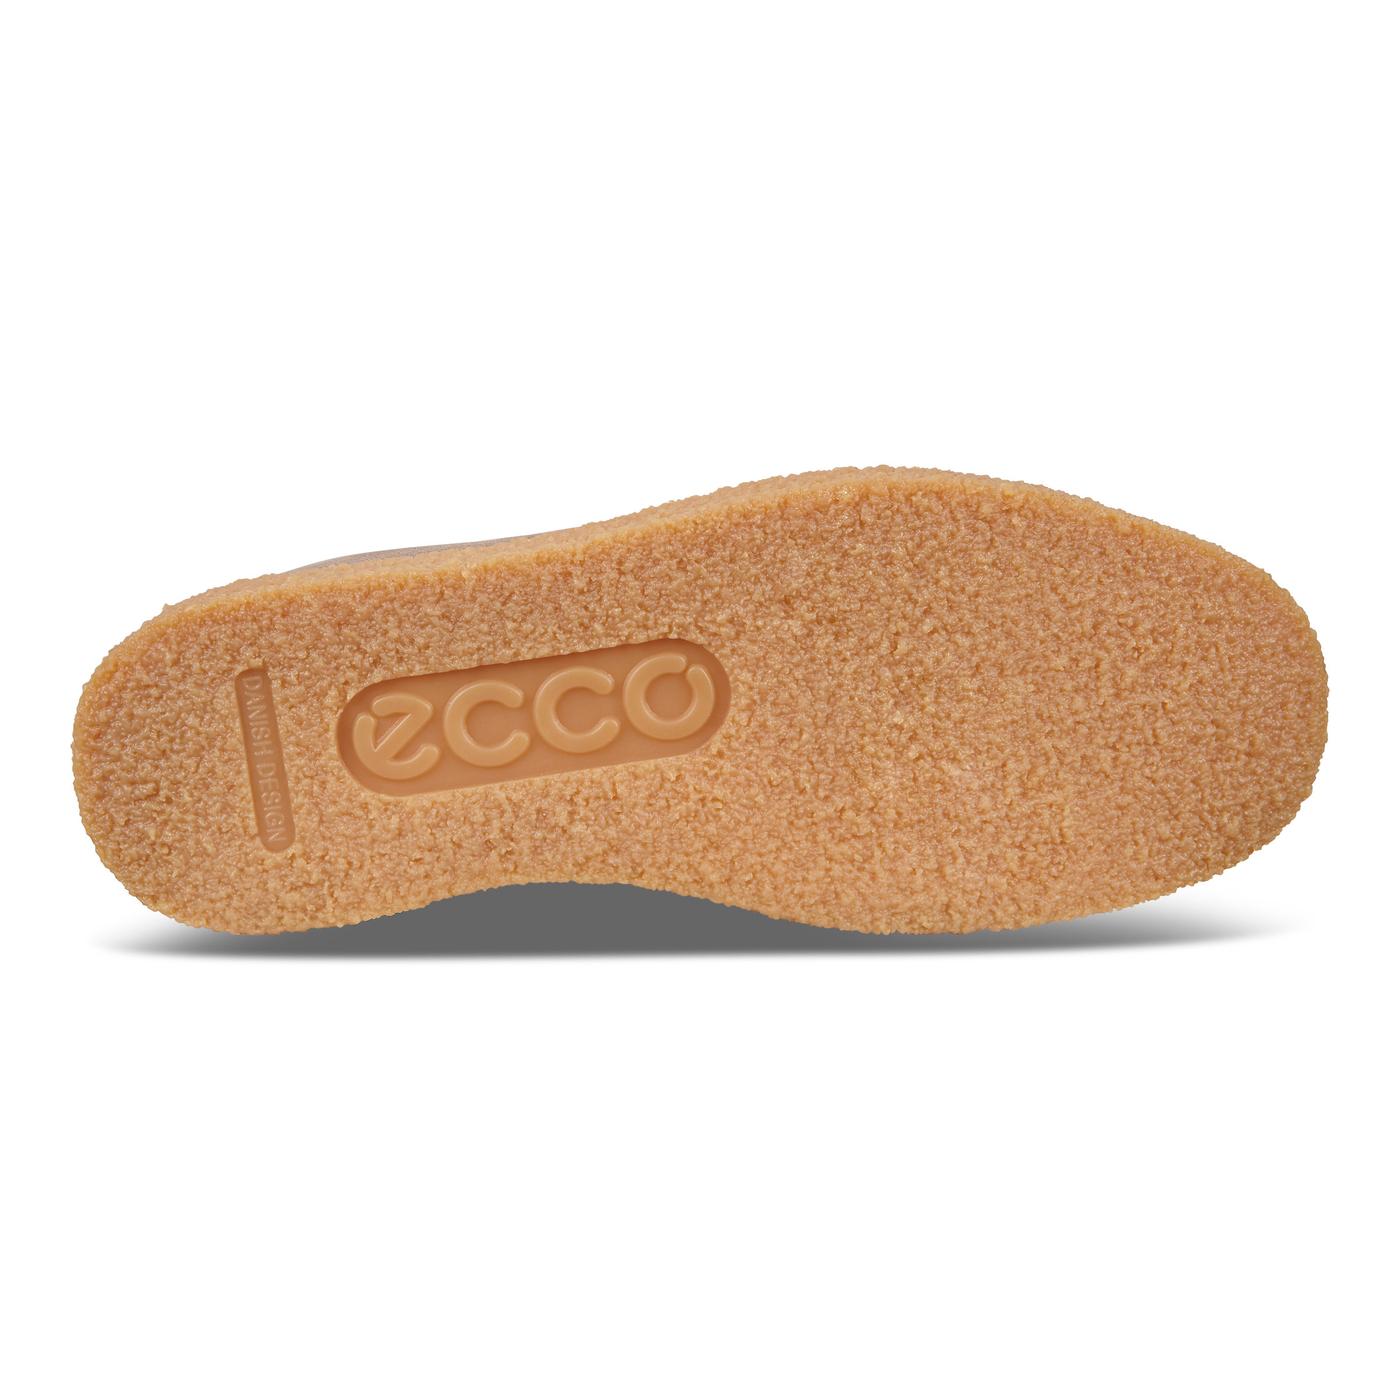 ECCO Womens Crepetray Slip On